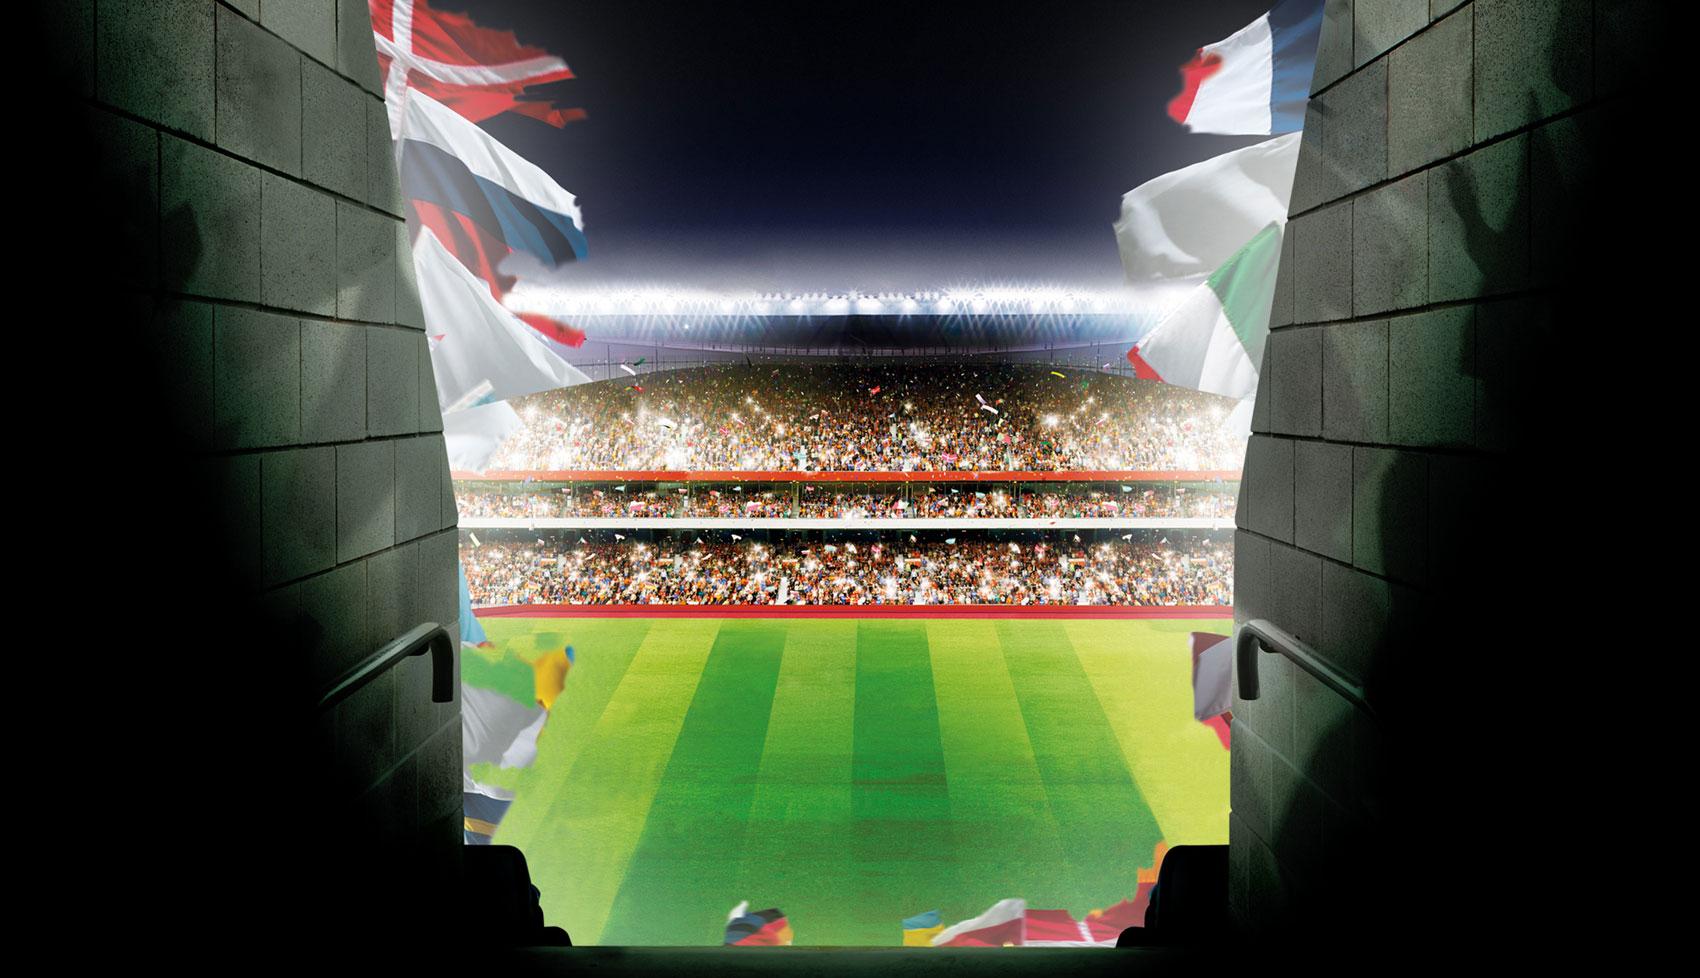 carlsberg-rugby-2